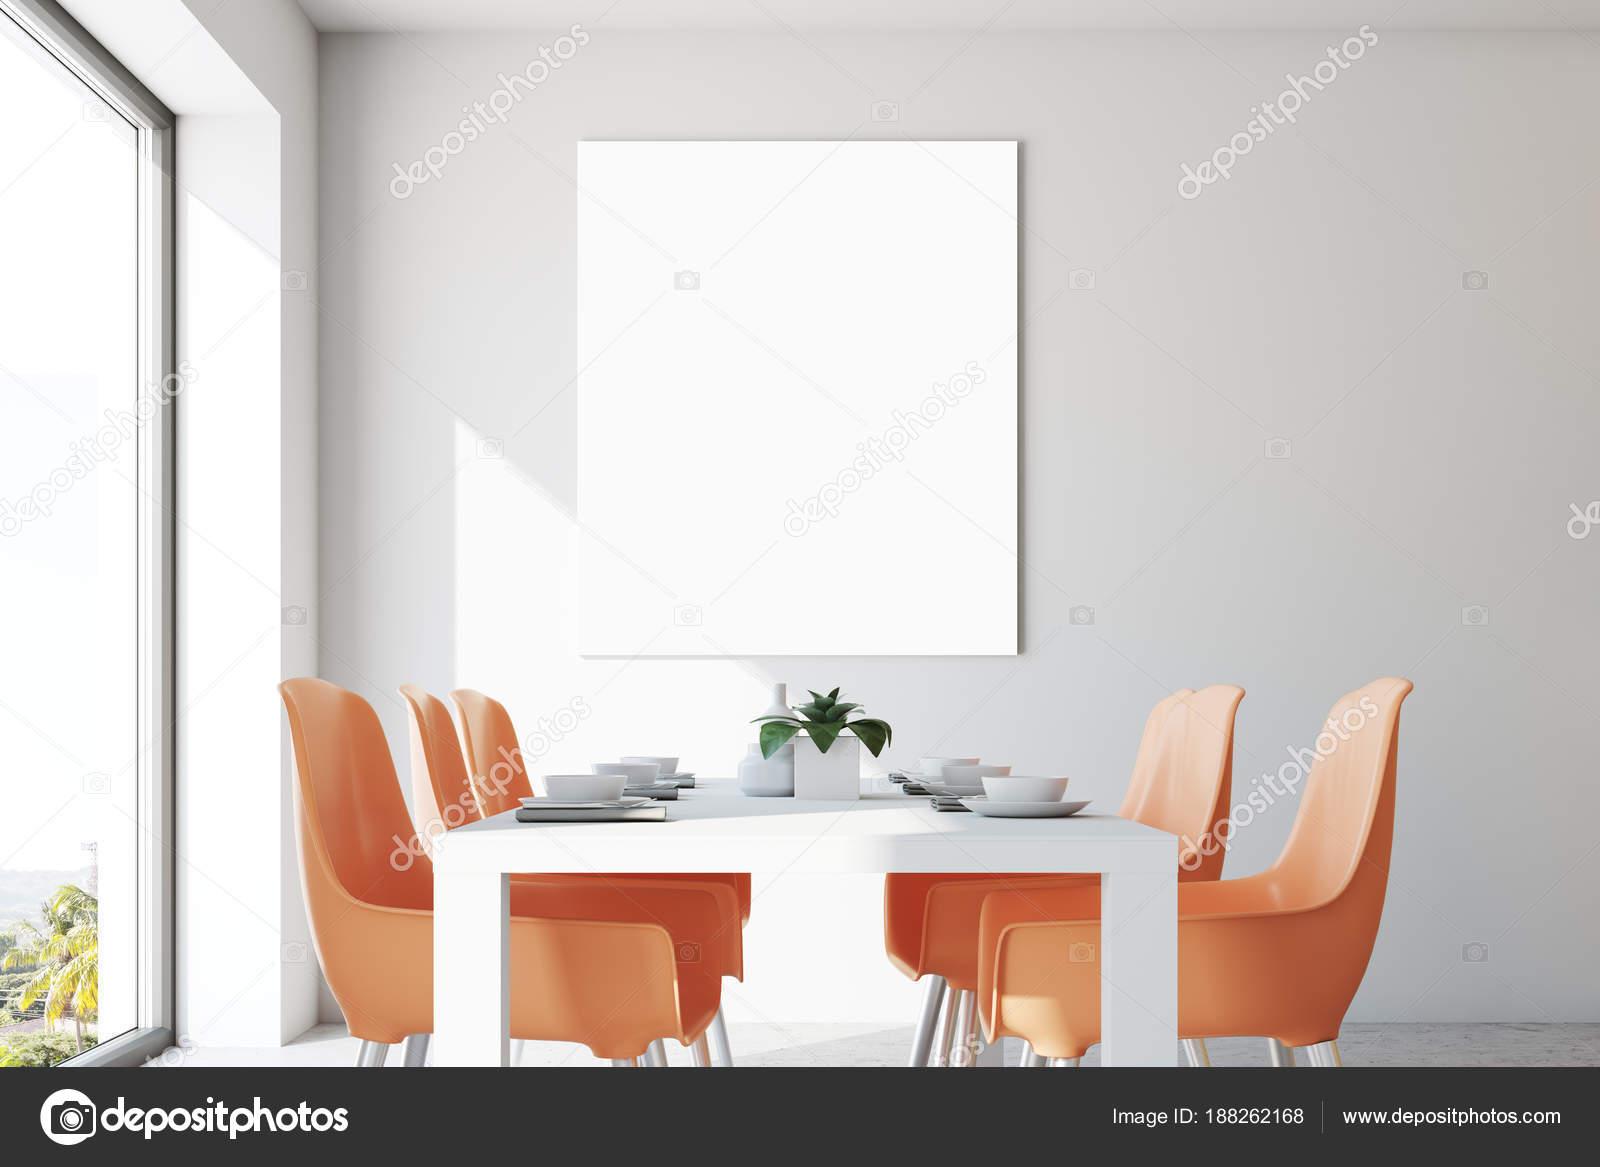 Eetkamer Van Oranje : Witte eetkamer oranje stoelen poster close up u stockfoto